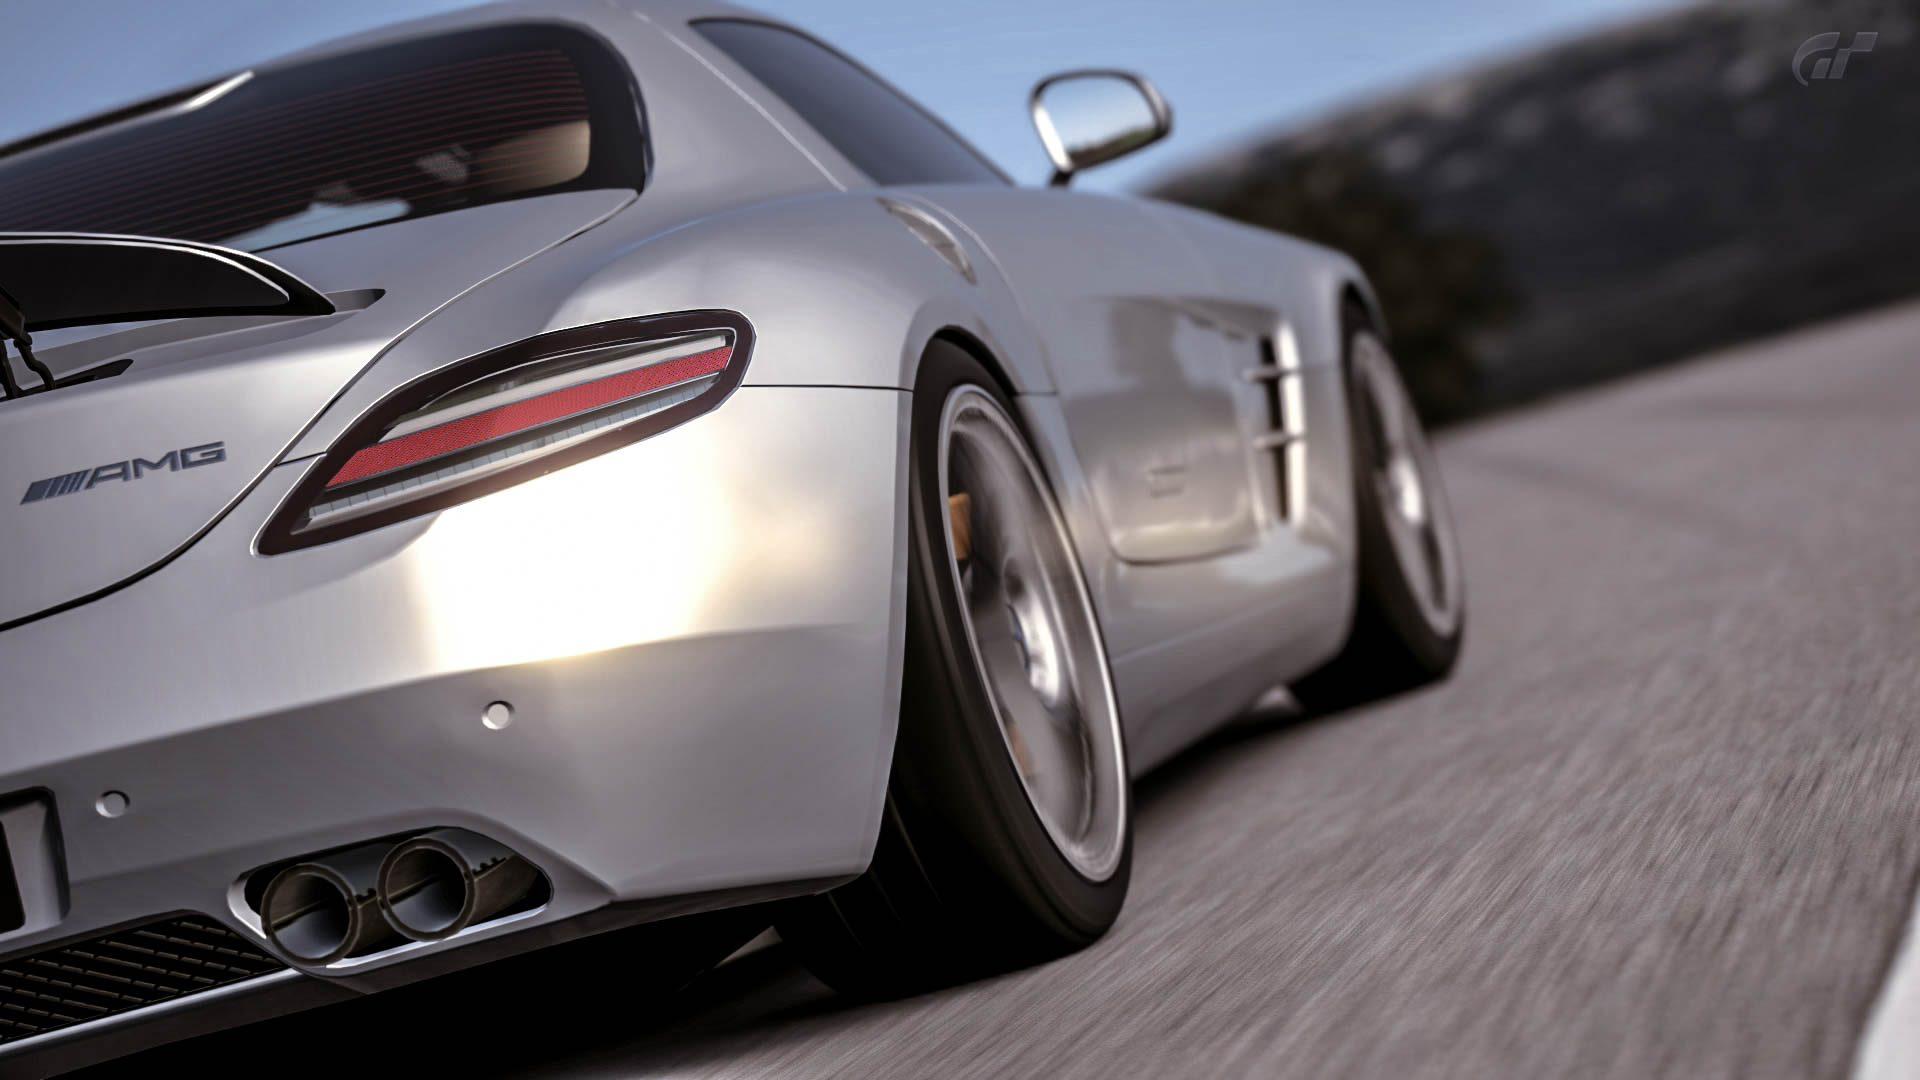 Mercedes_SLS_AMG_08.jpg